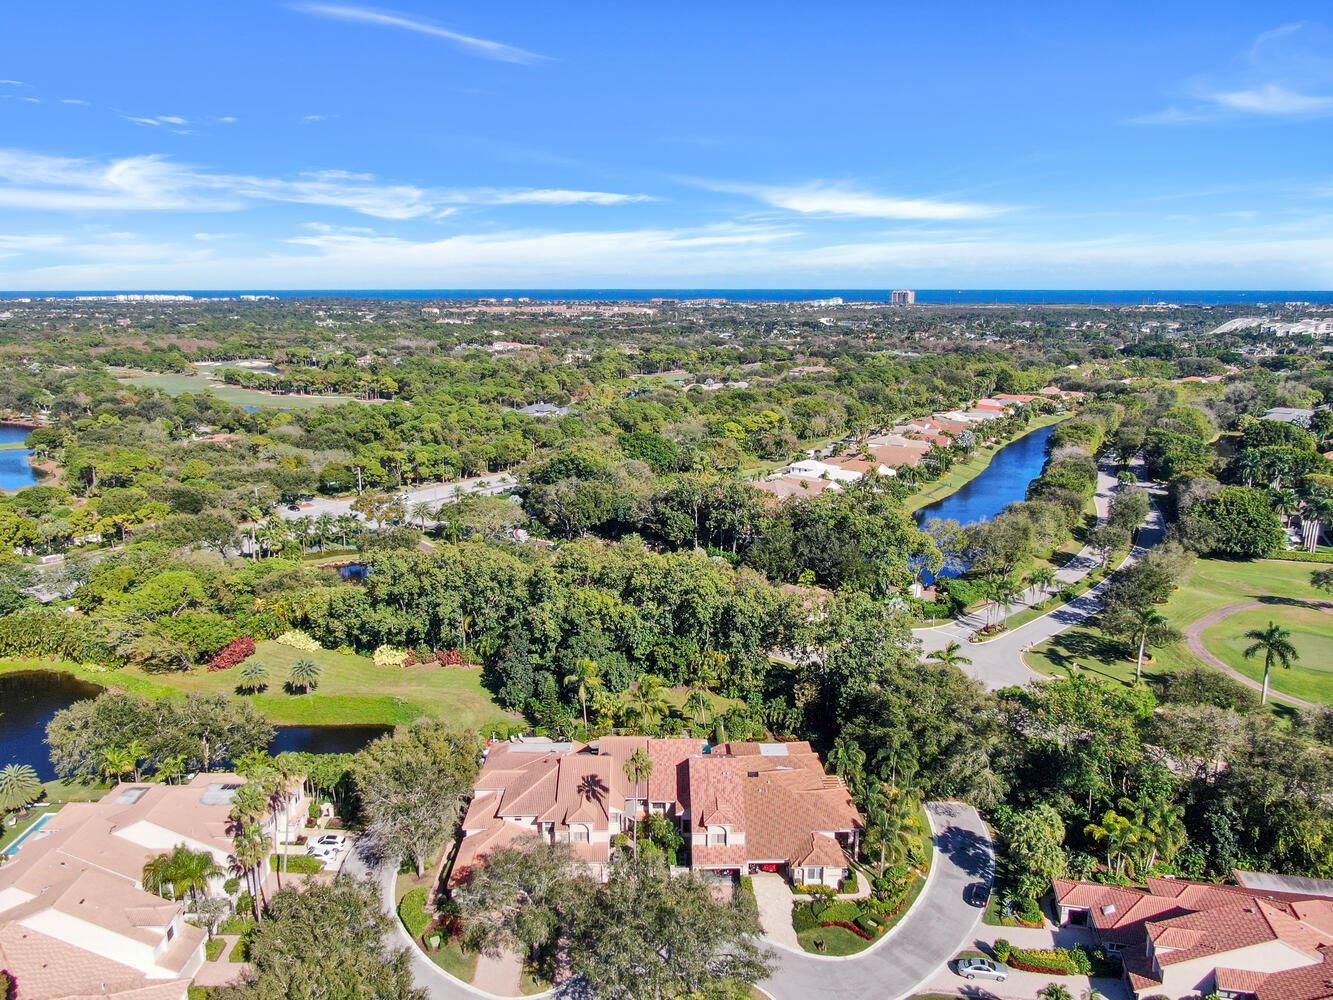 Photo of 13900 Parc Drive, Palm Beach Gardens, FL 33410 (MLS # RX-10680825)